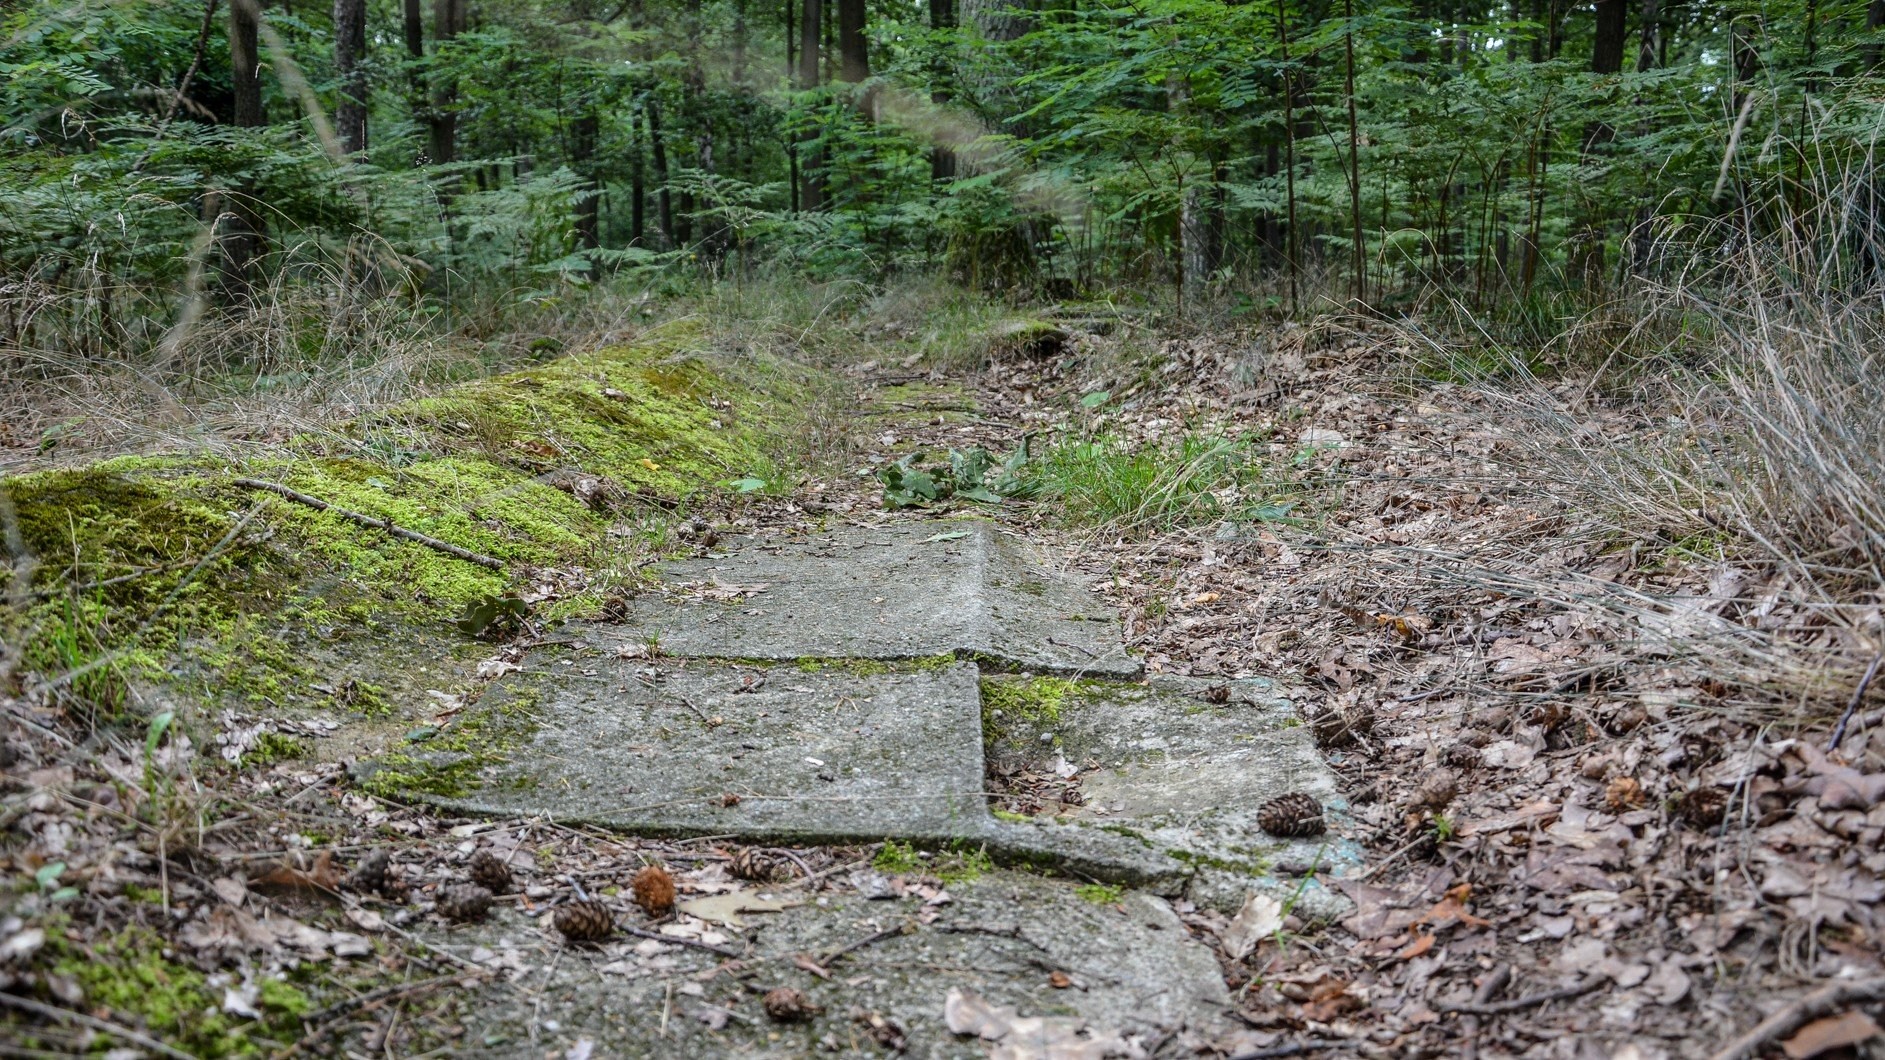 beton platten avus südkurve modell berlin charlottenburg lost places urbex abandoned berlin